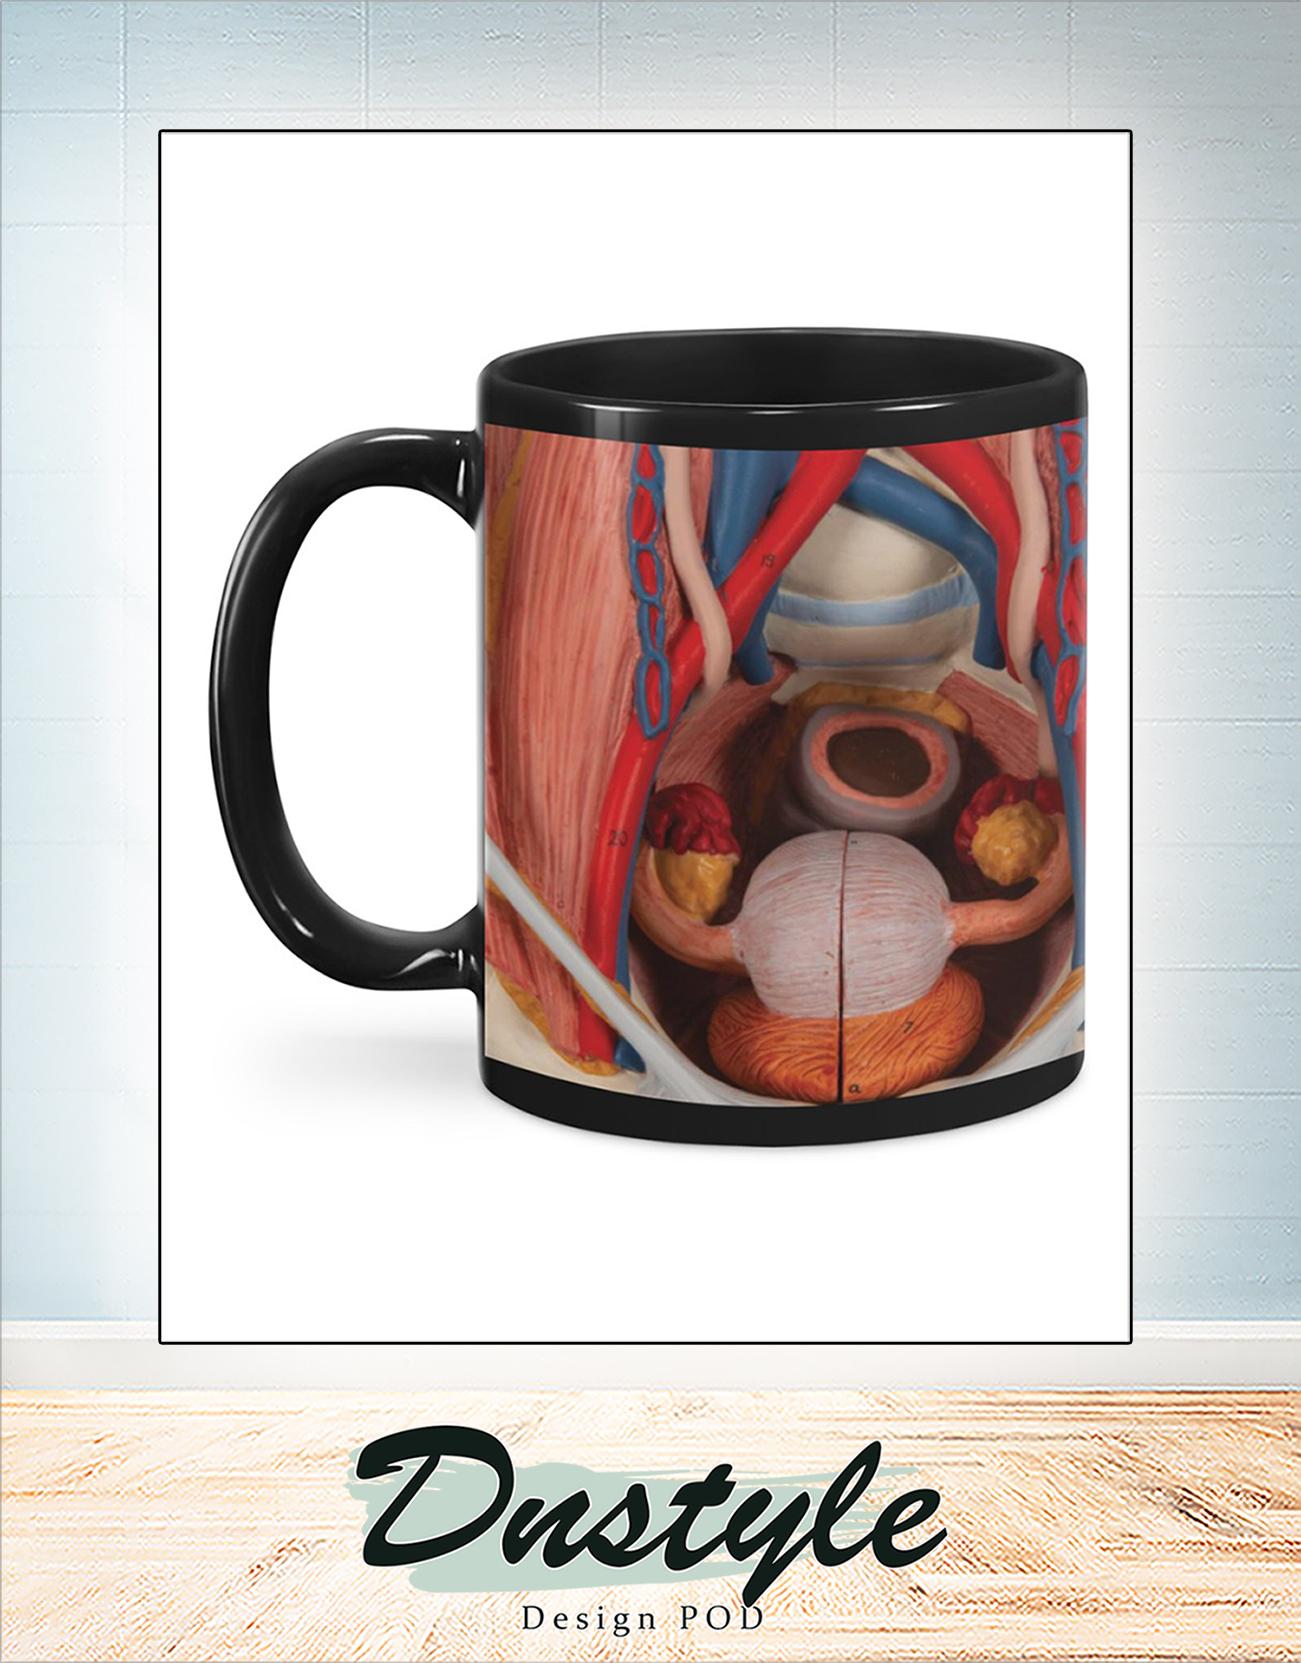 Urinary mug 1